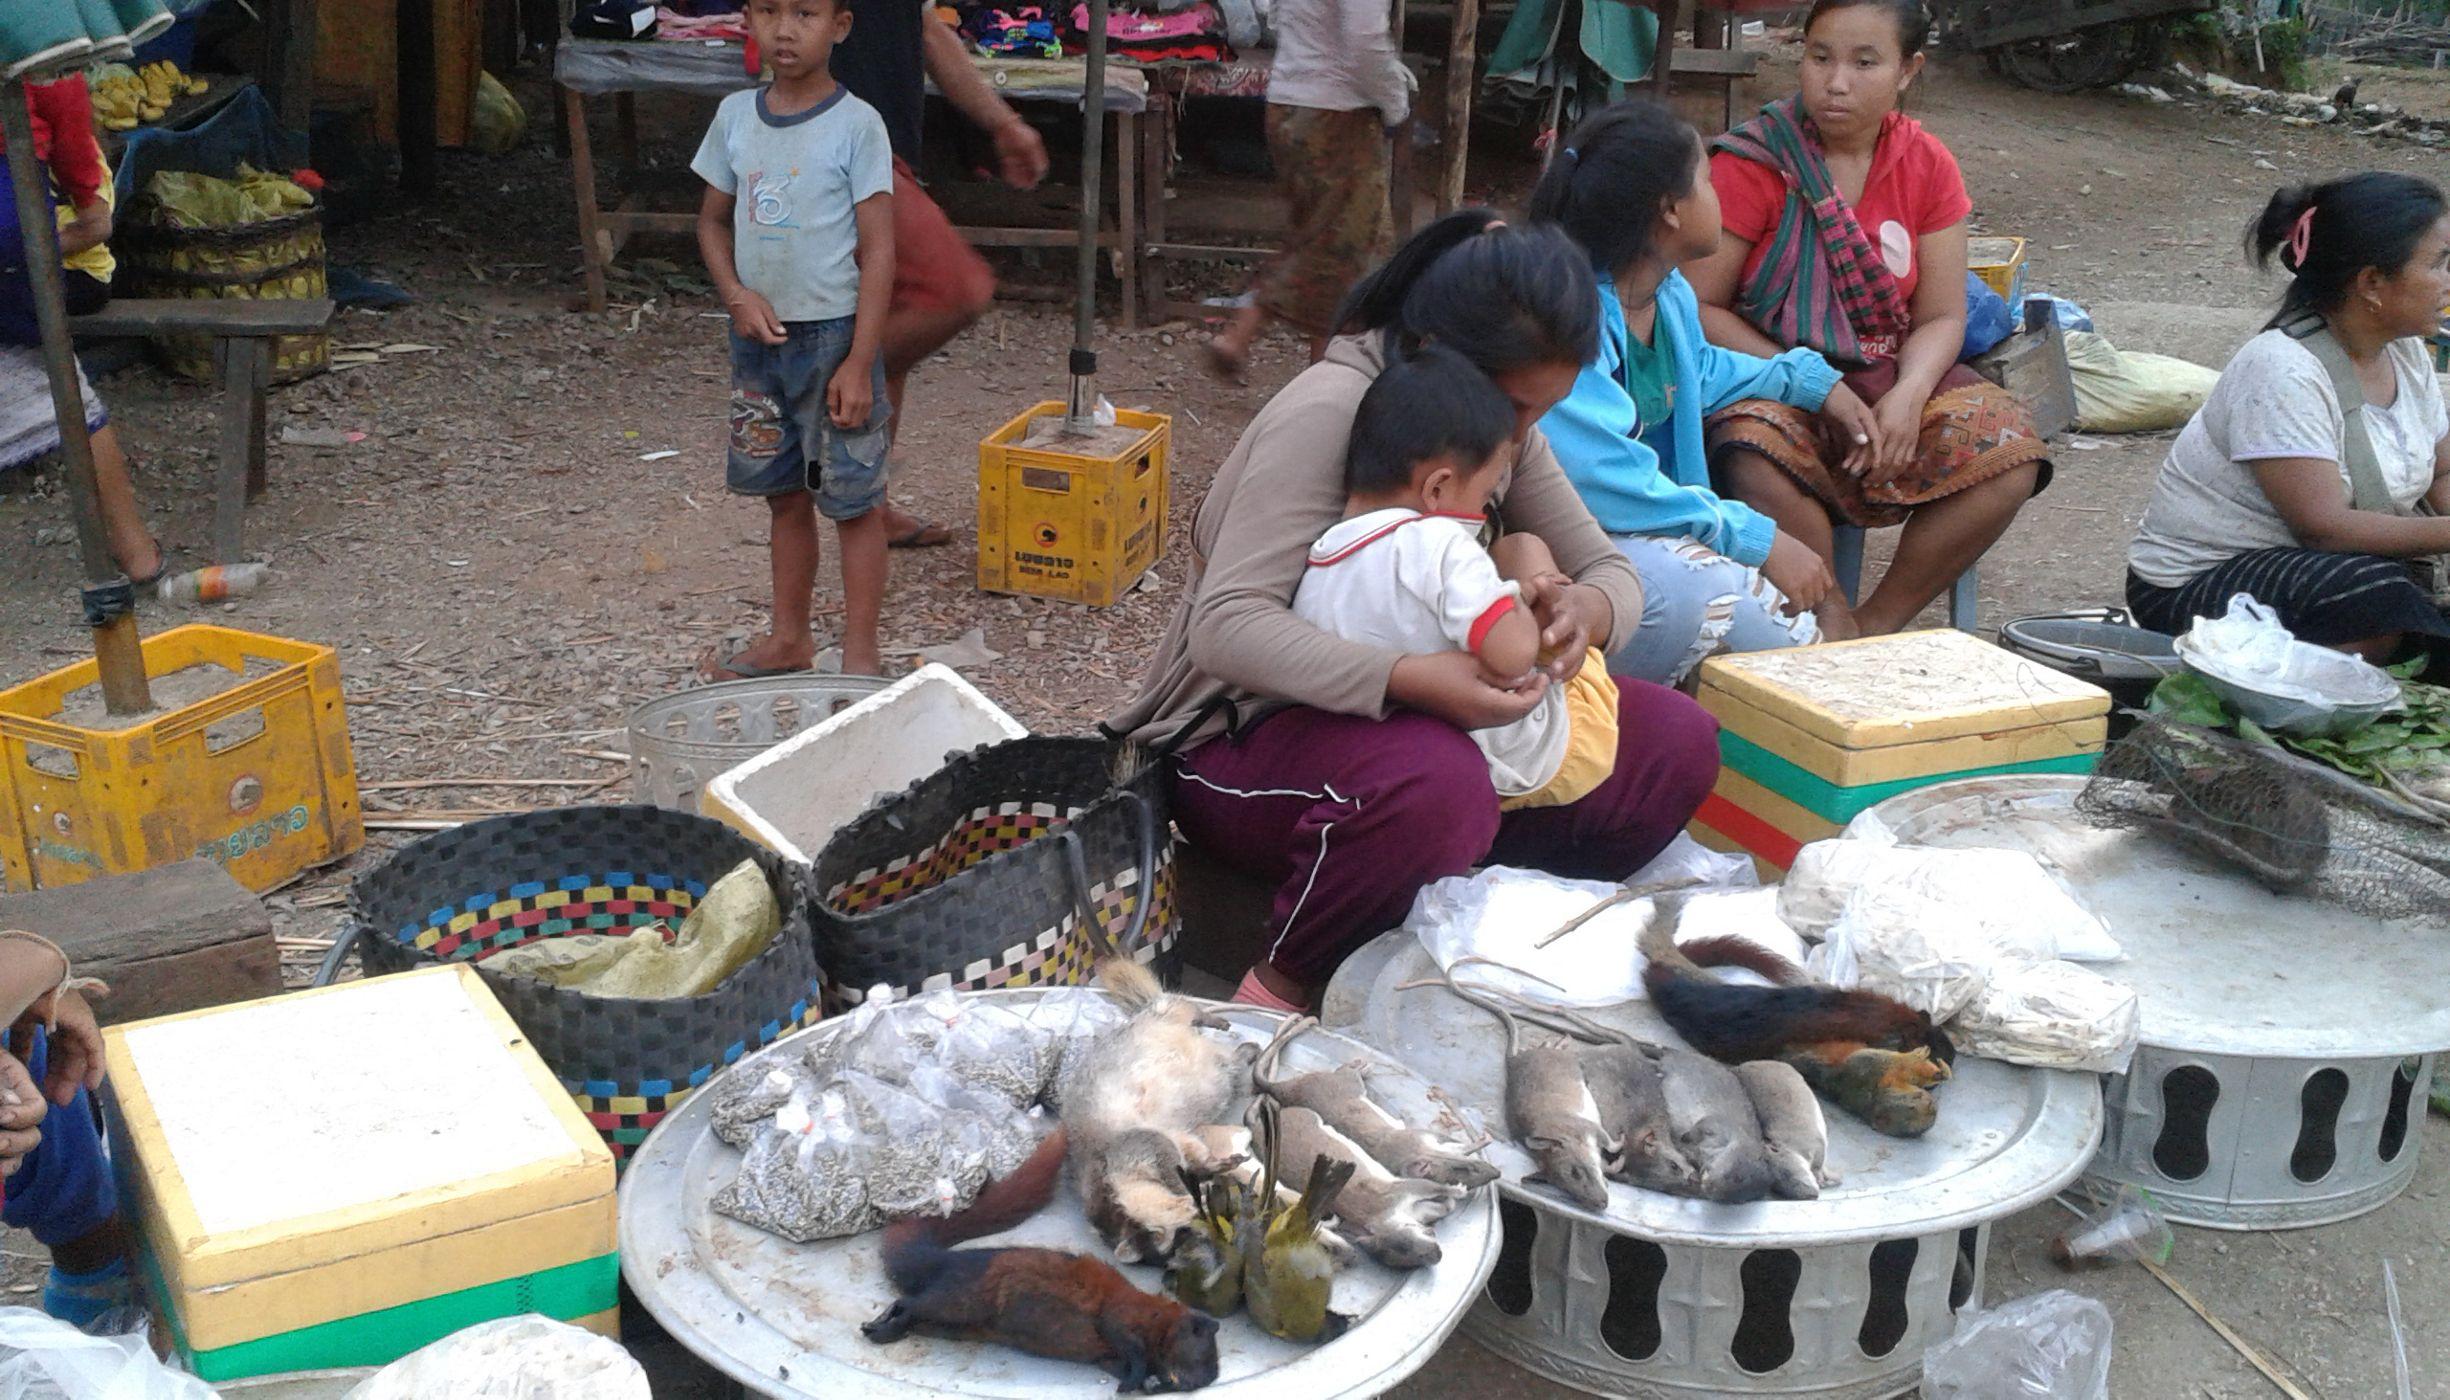 Wildlife meat market in Laos